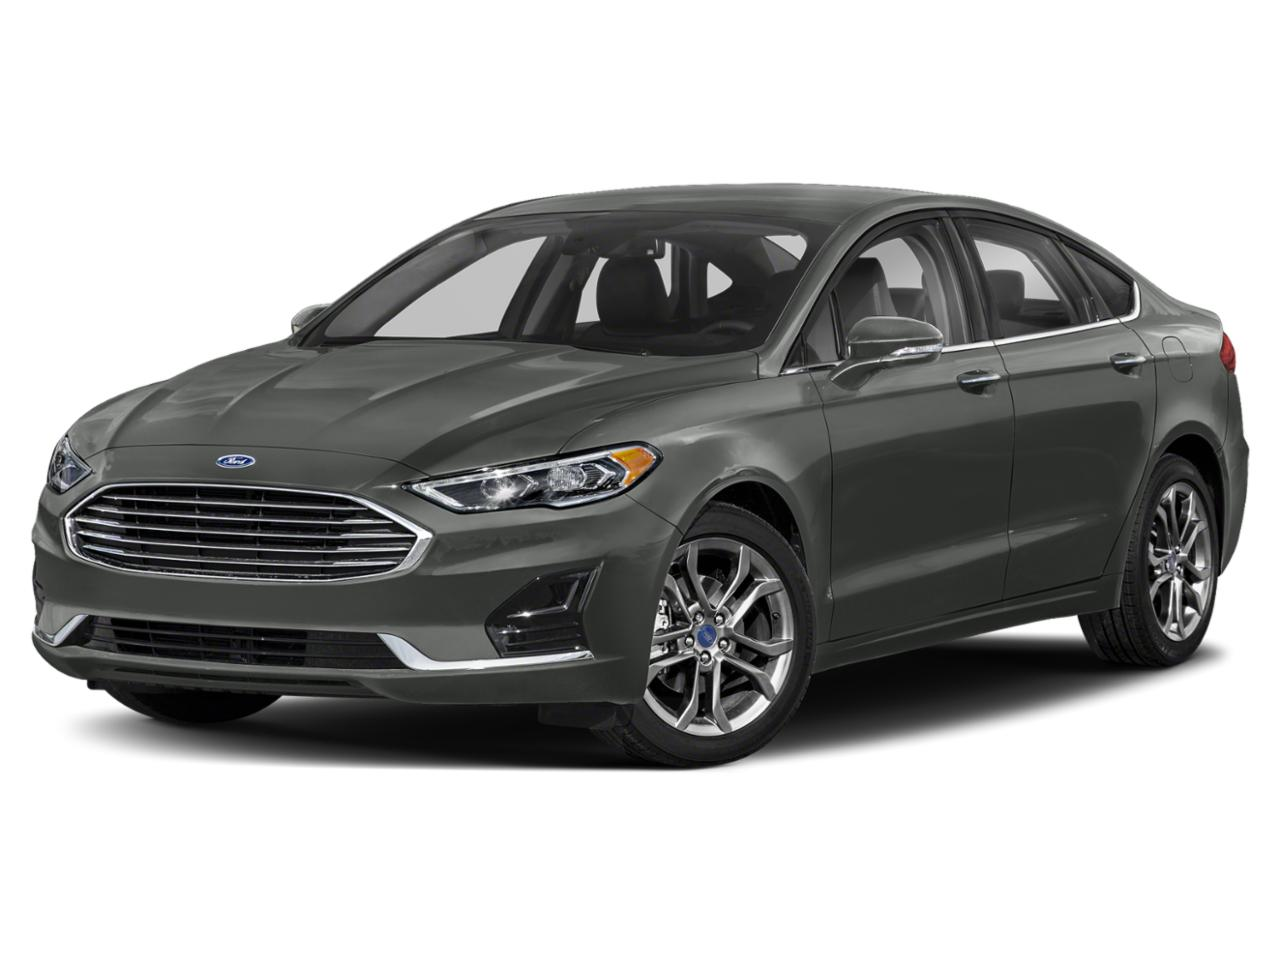 2020 Ford Fusion SEL 4dr Car Slide